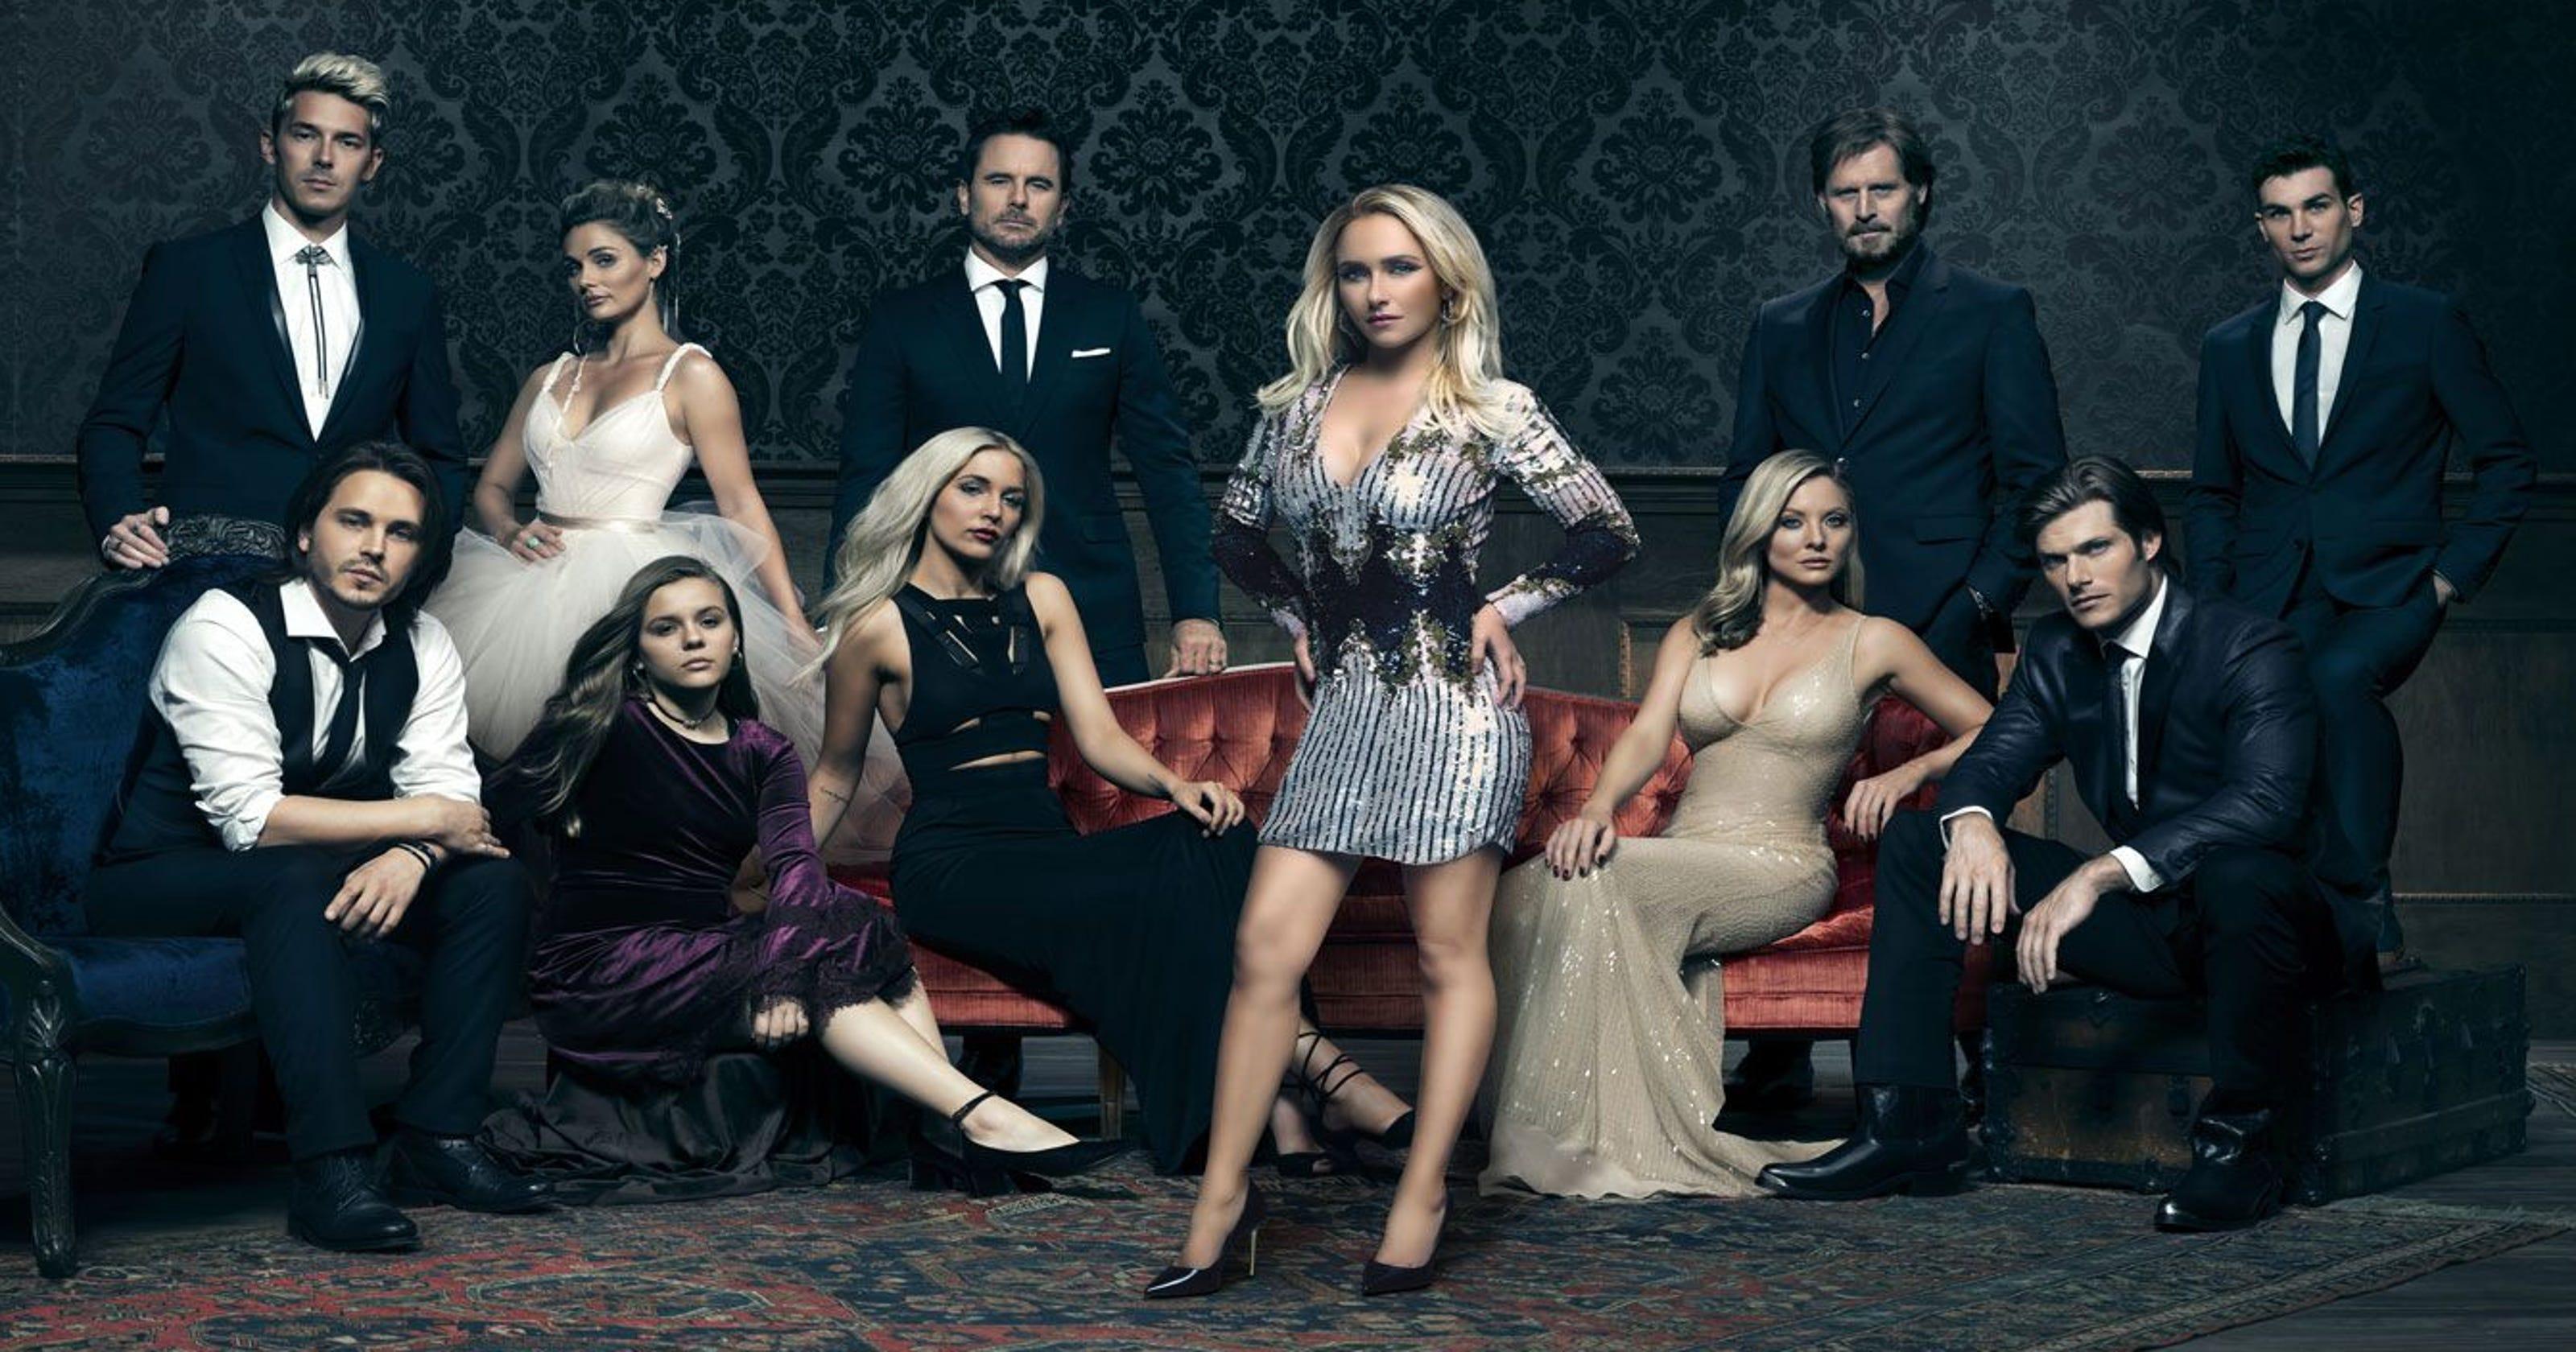 Nashville tv show actors dating in. rubidium strontium dating limitations of qualitative research.